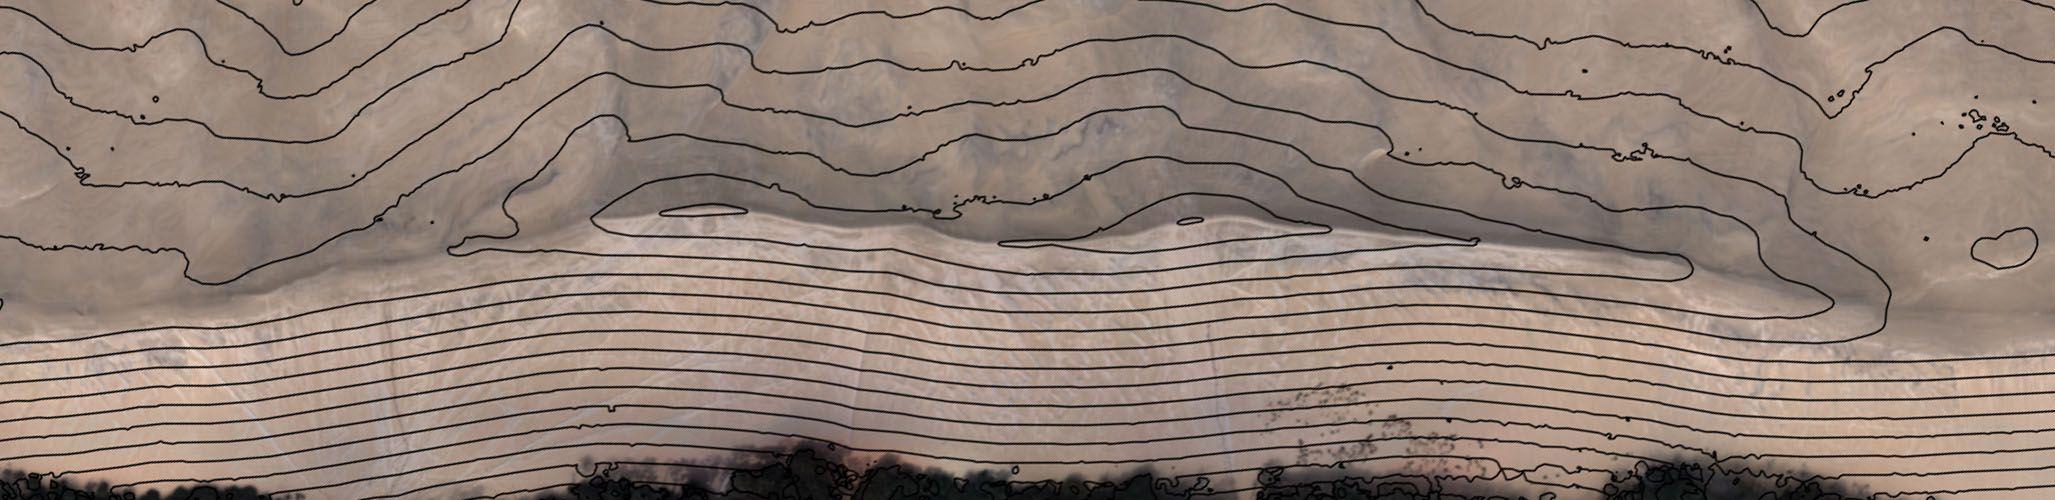 Elevation profiles and contour lines by Delair-Tech UAVs drones